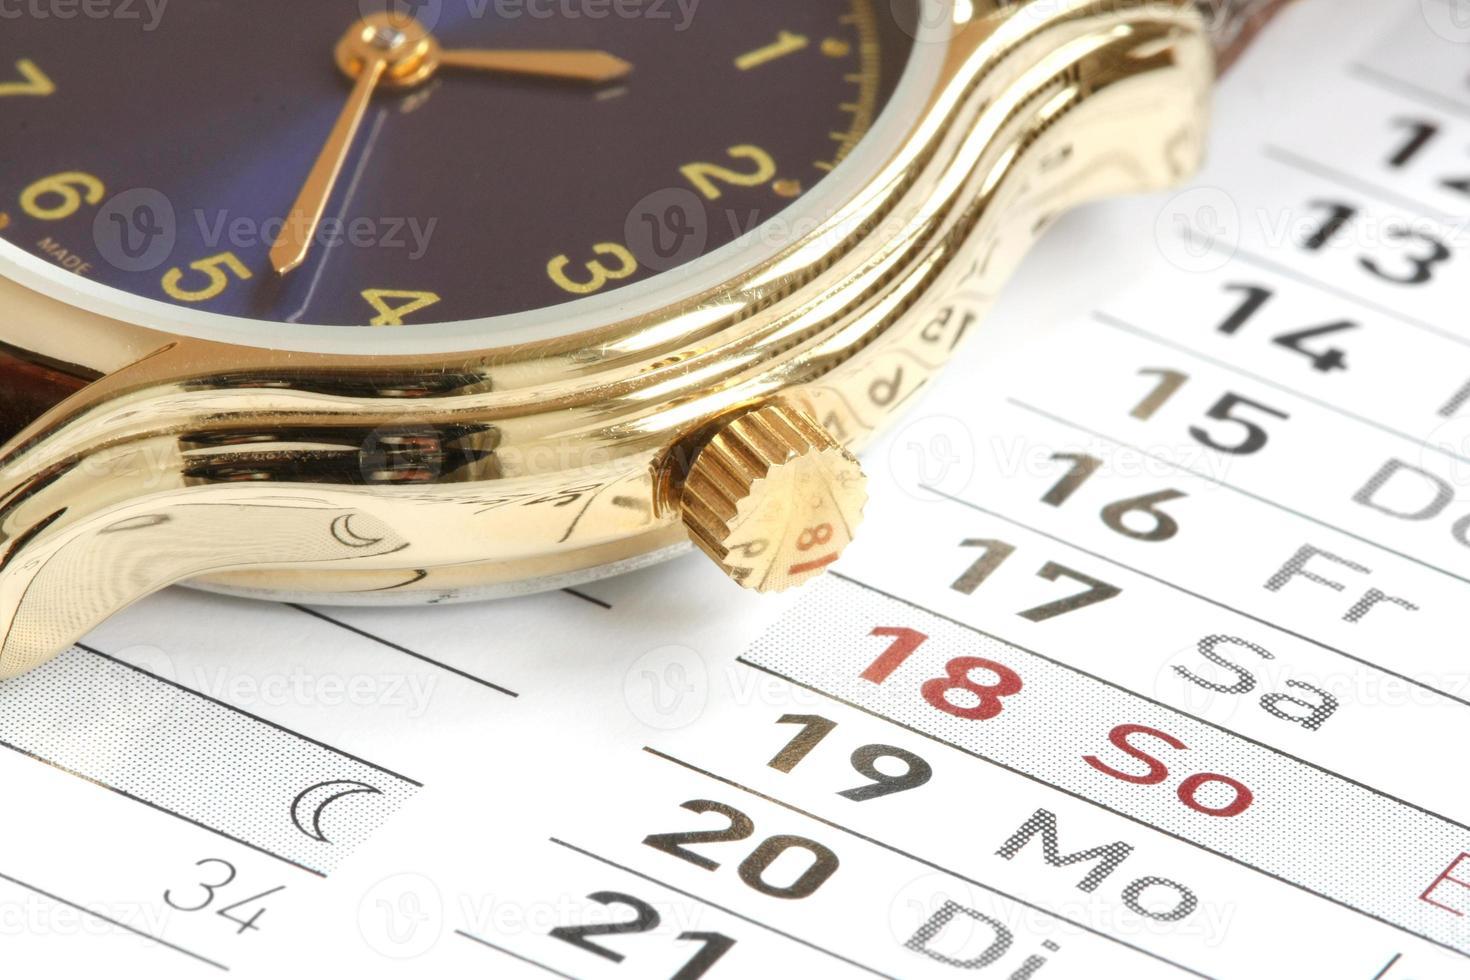 Wrist watch on the calendar background photo